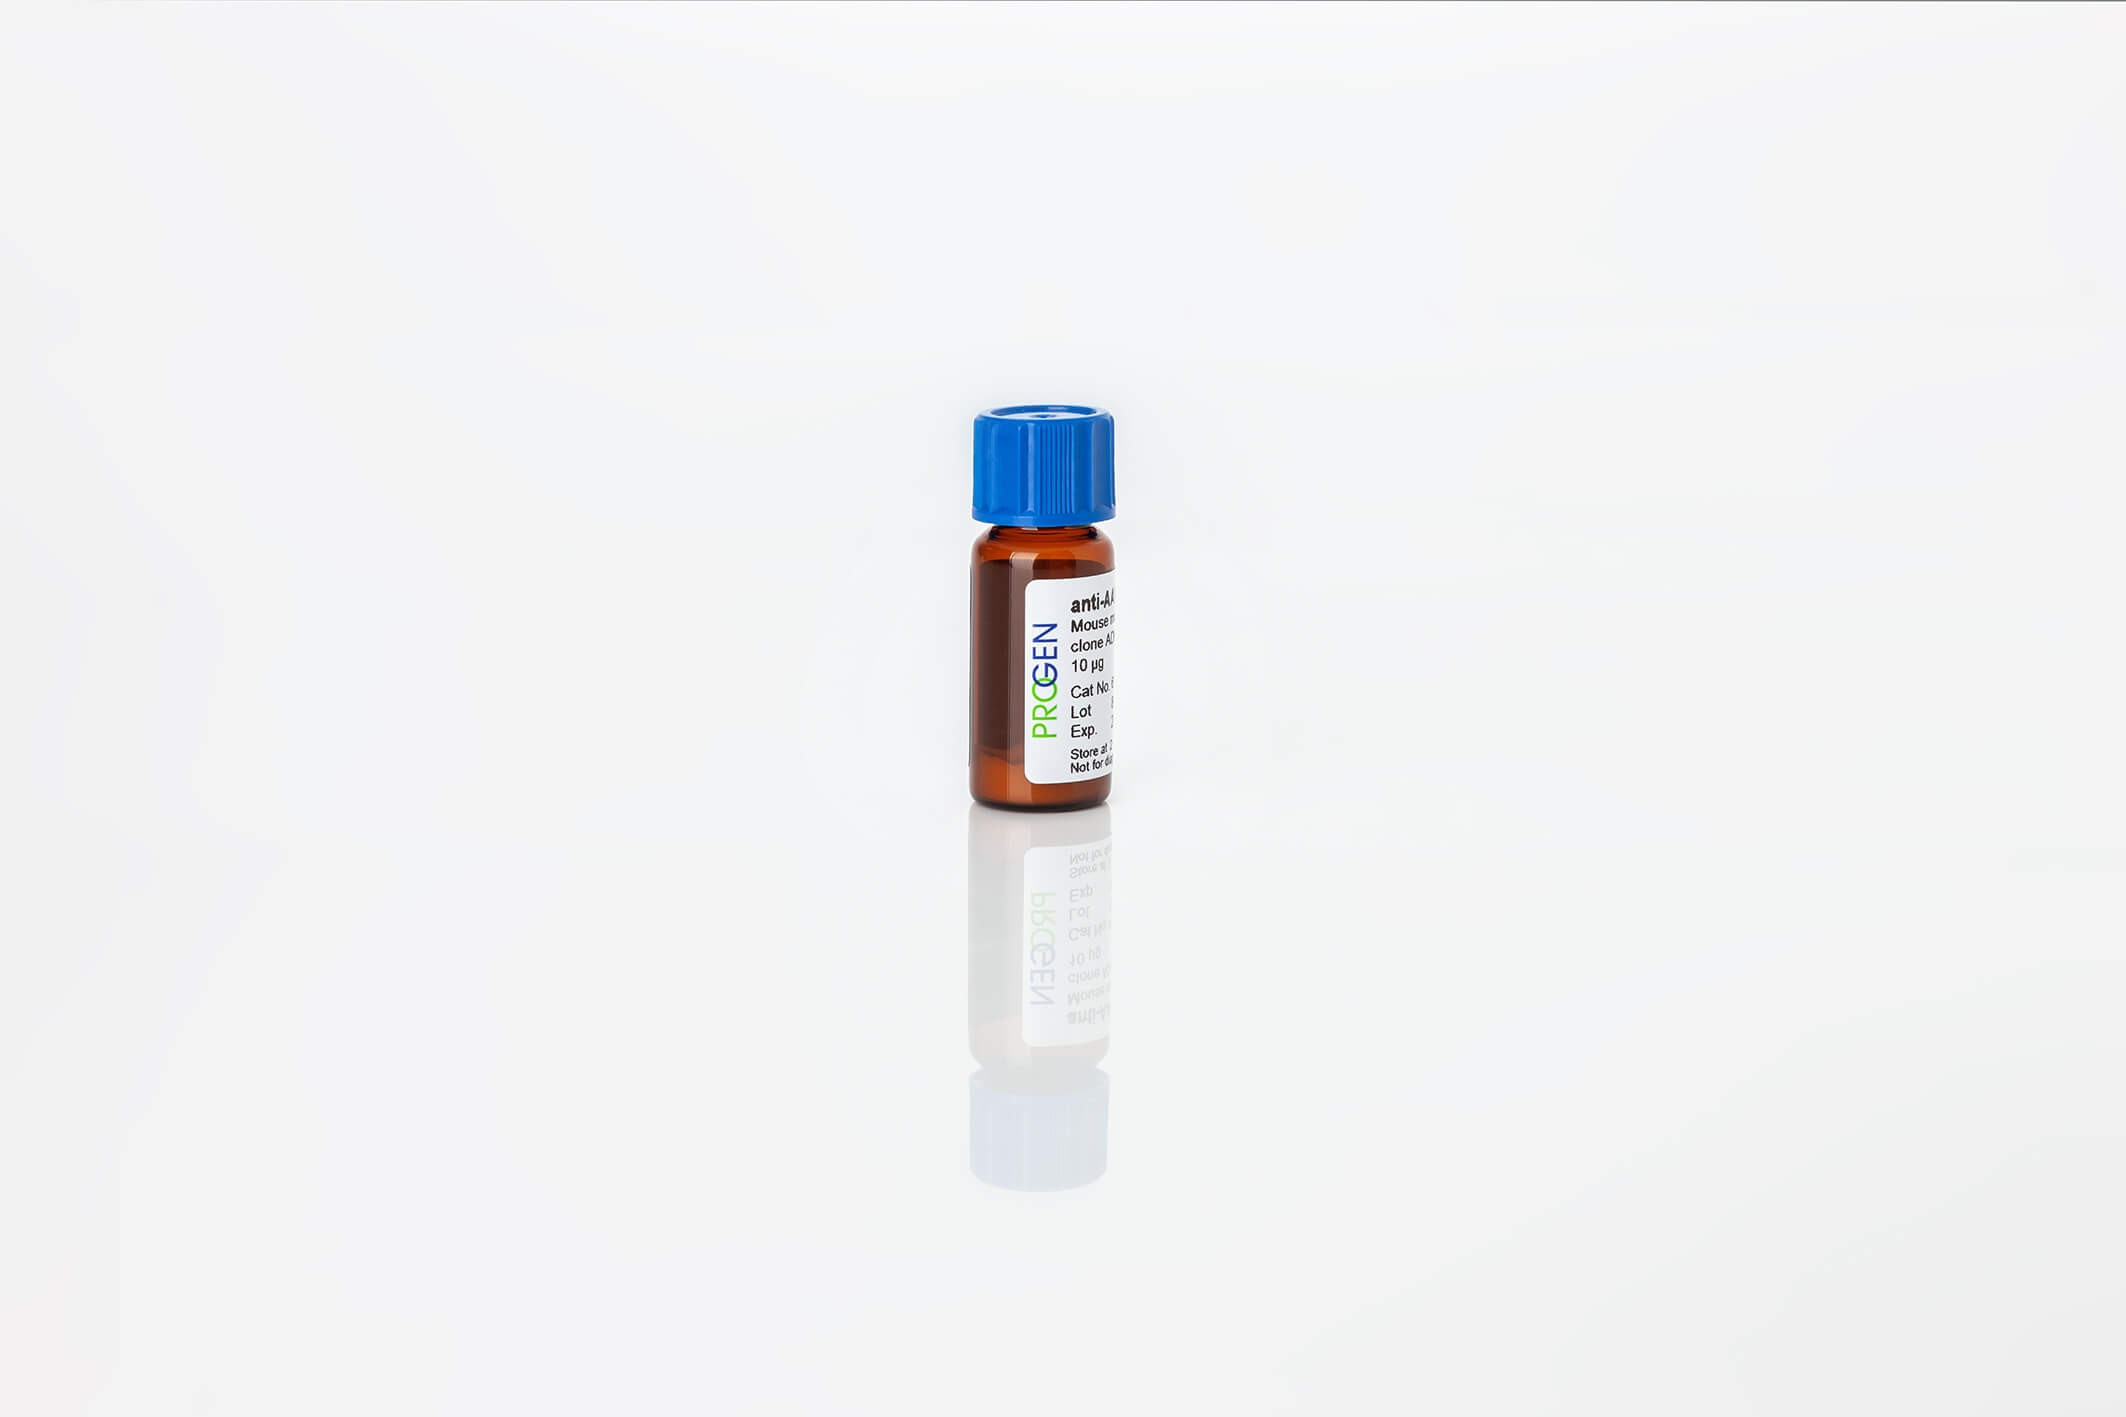 anti-p53 mouse monoclonal, BP53.12, ascites